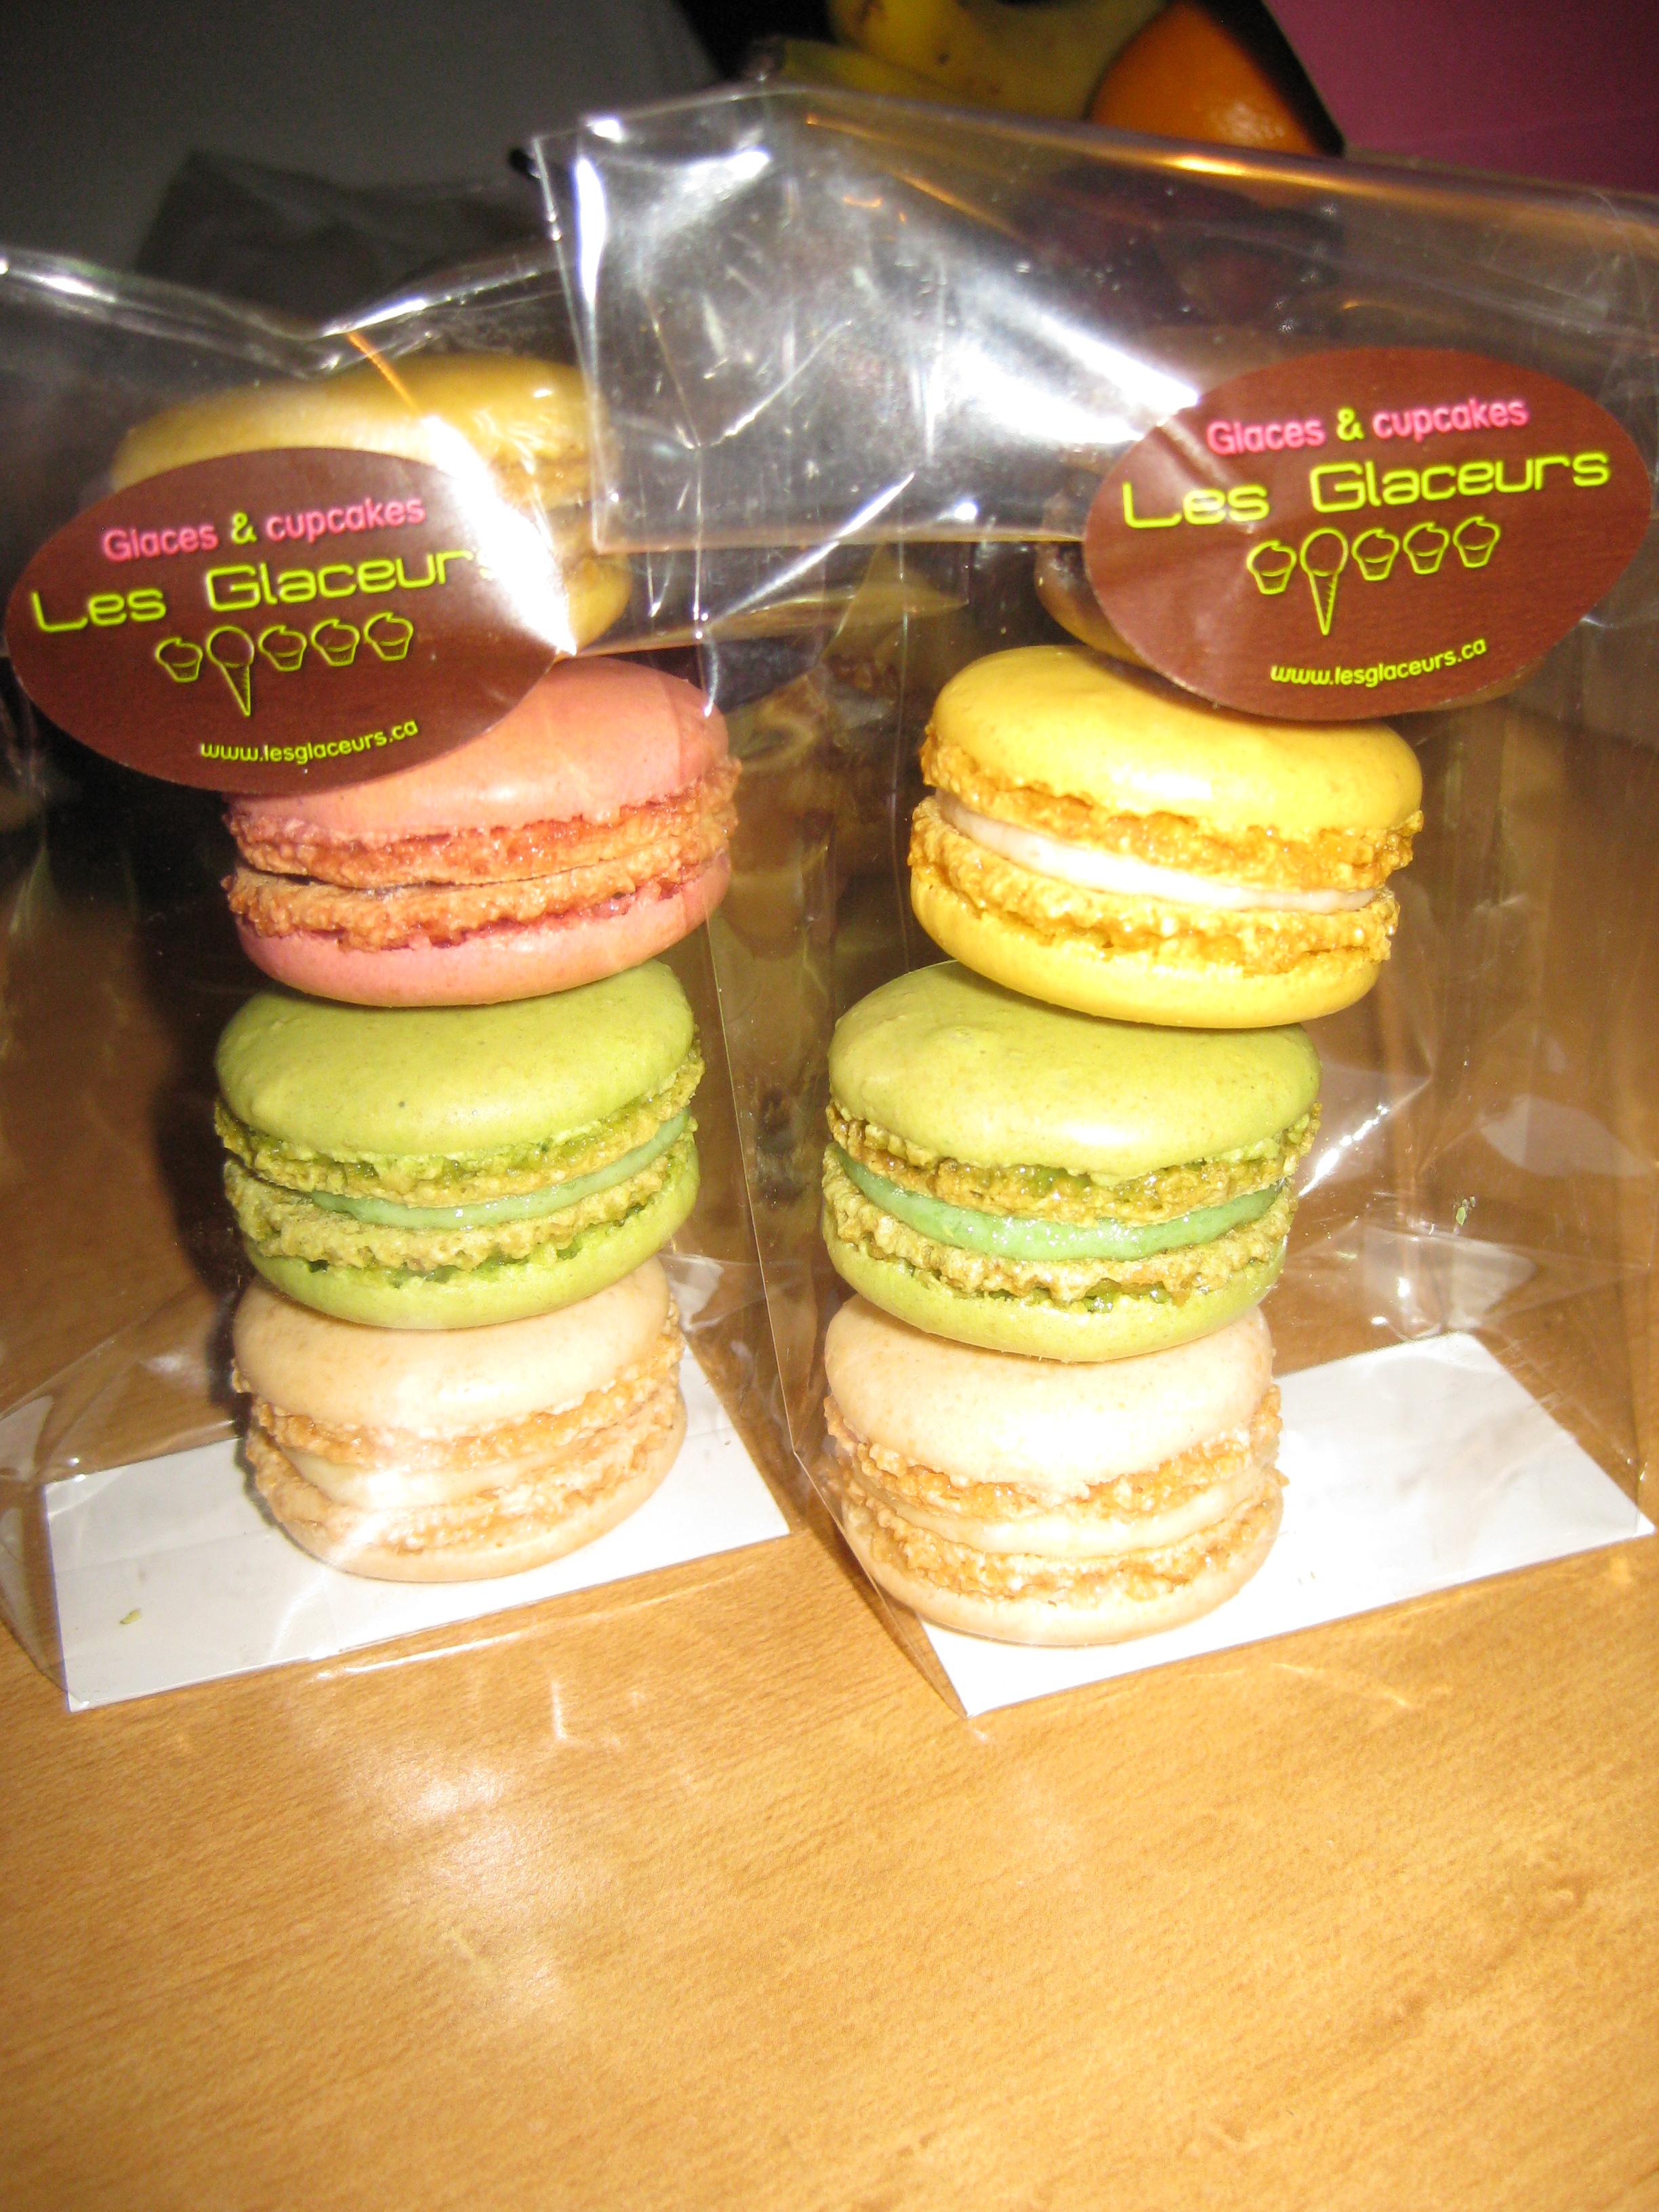 Macarons 1 - Les Glaceurs